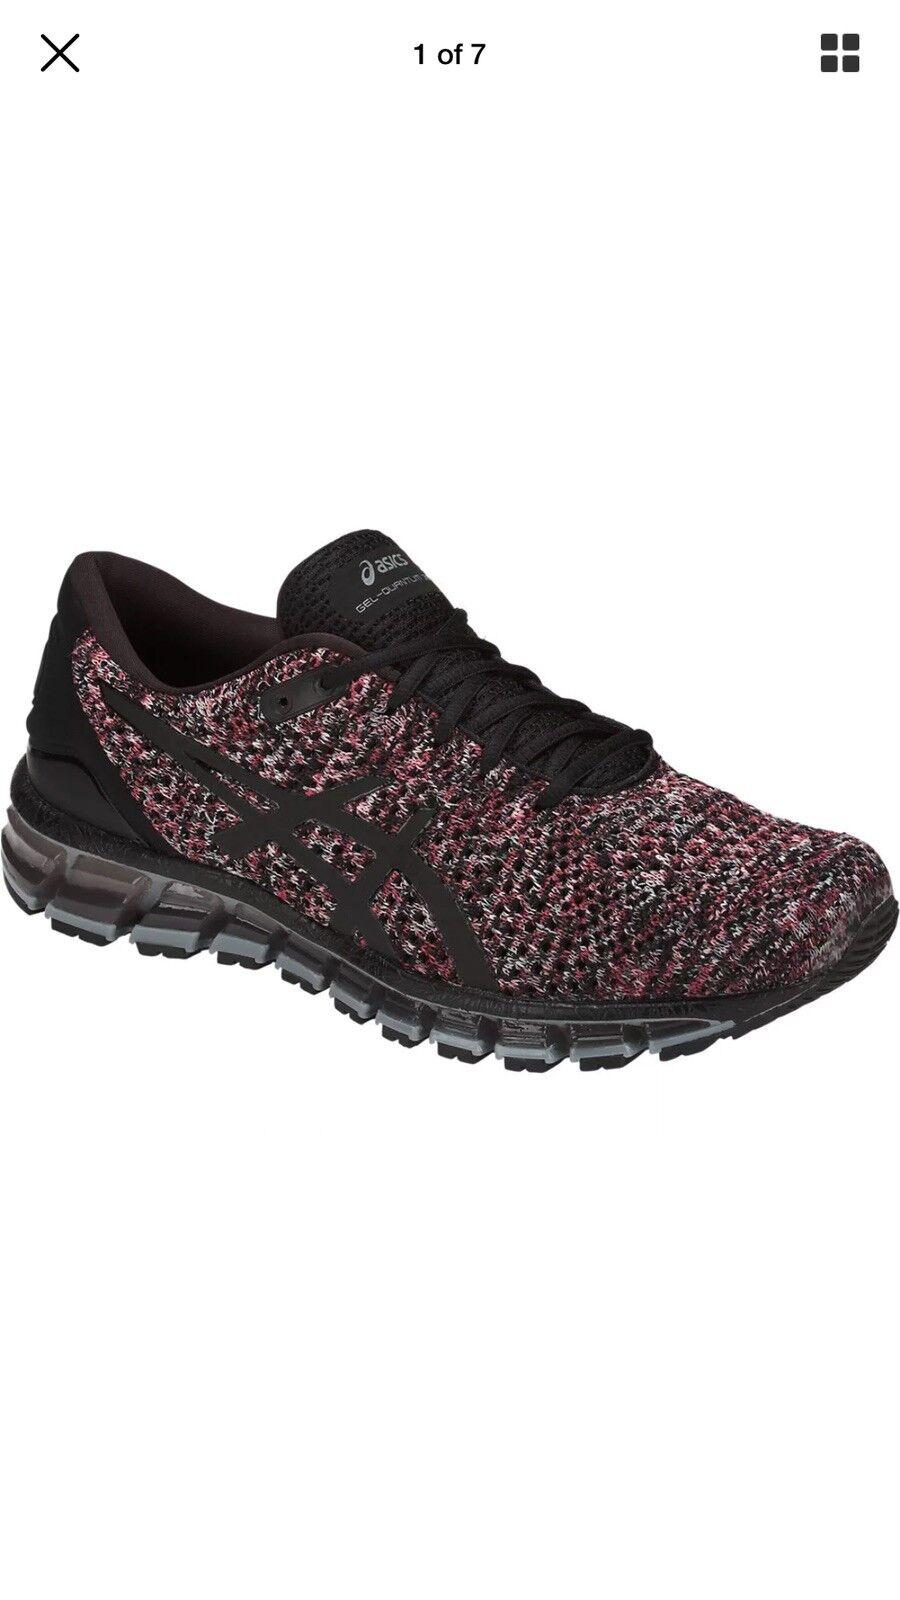 Asics Gel Quantum 360 Knit 2 T840N.9023 Men's Running Shoes 10 M Black Red Grey